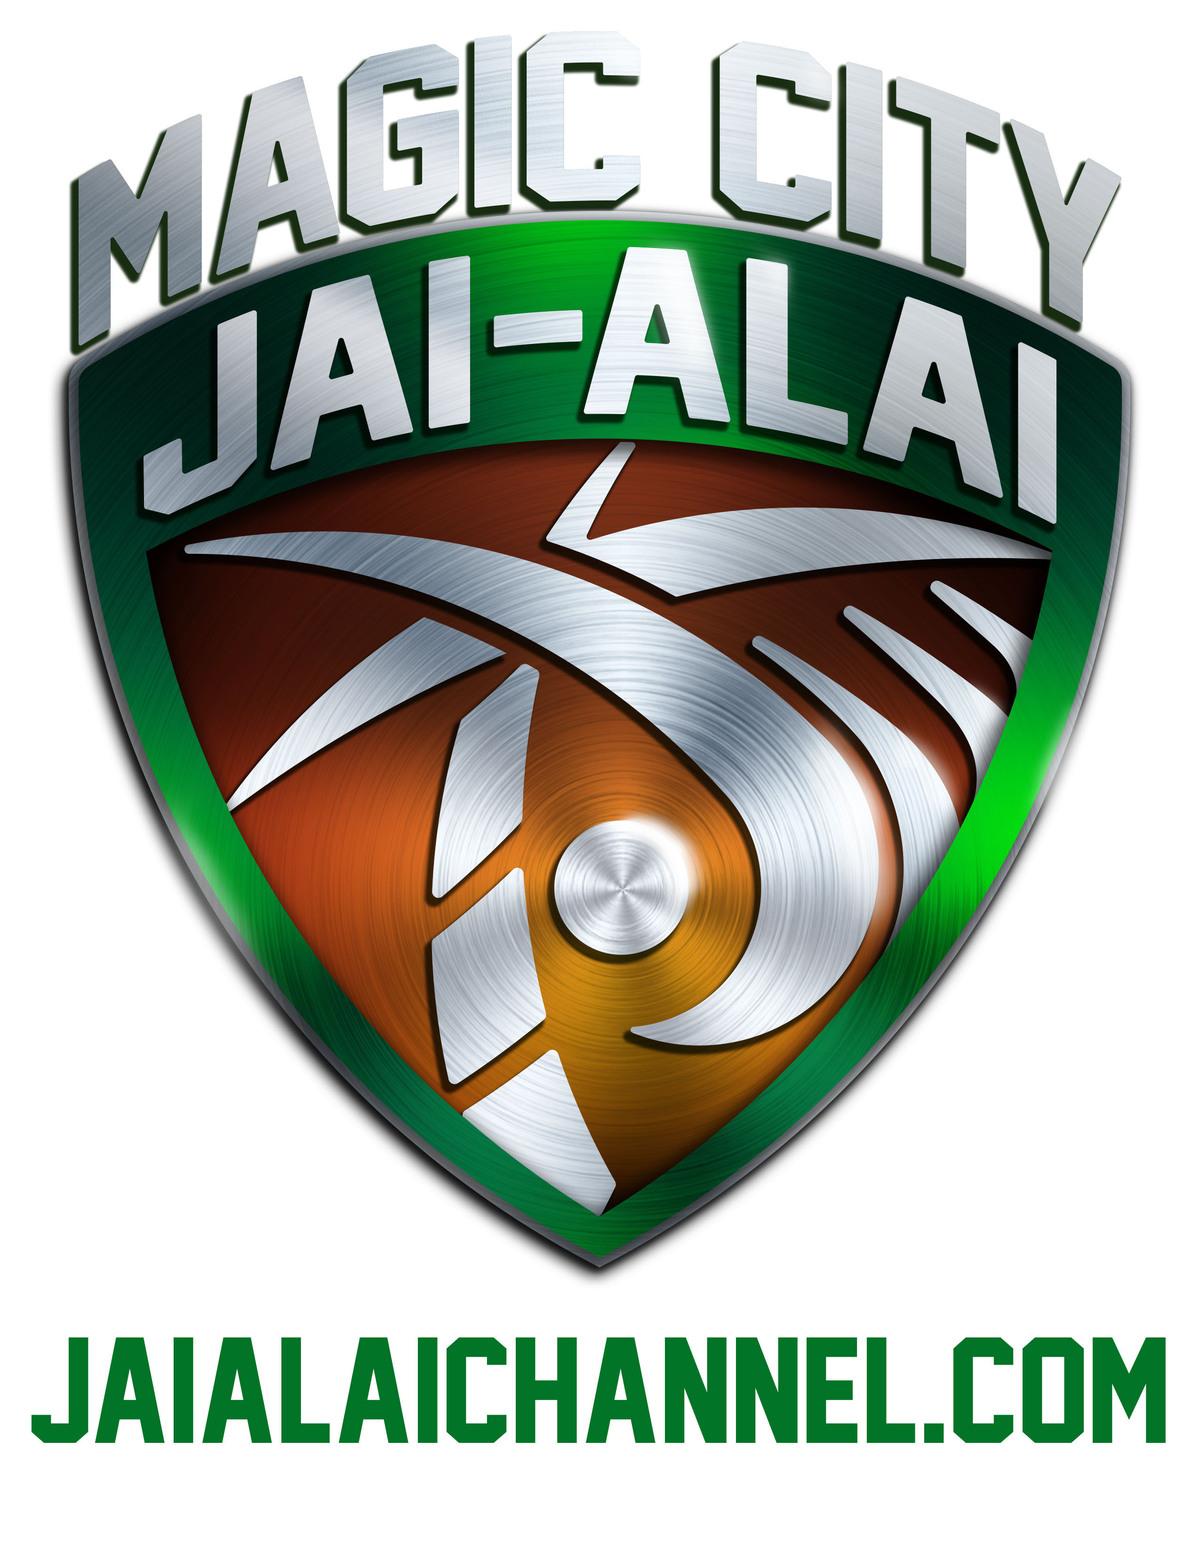 Jai-Alai H2H - Doubles H2H - Sat. Jun 26, 2021